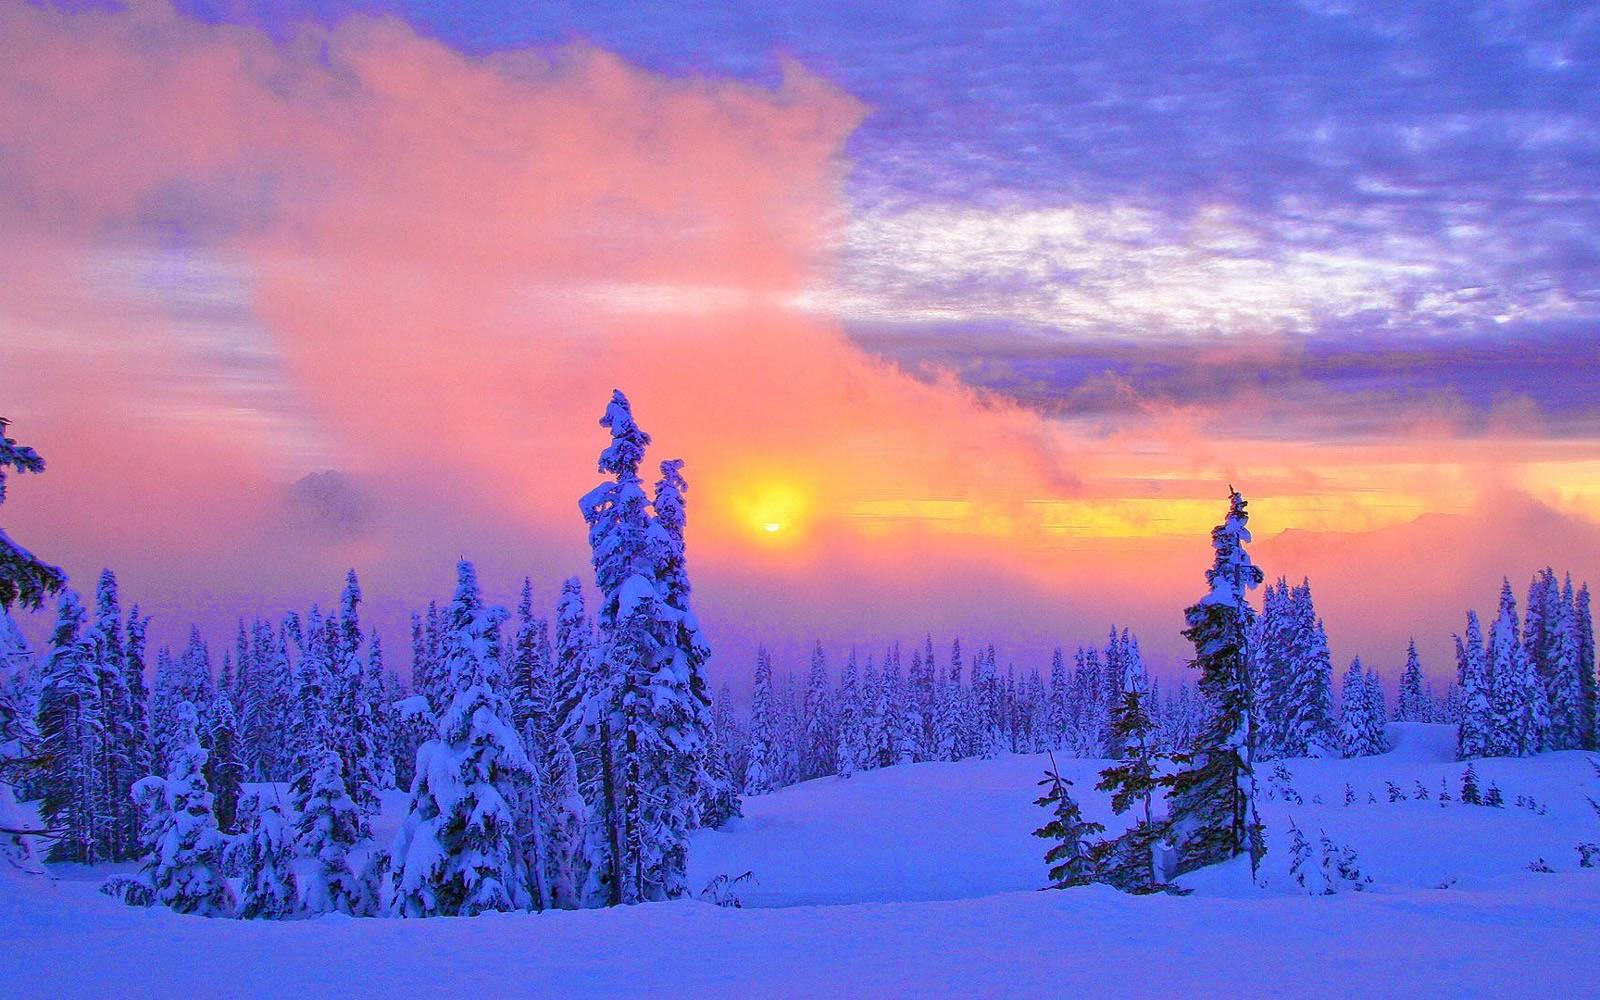 Winter Scenery Wallpapers Beautiful Winter Scenery Desktop Wallpapers 1600x1000